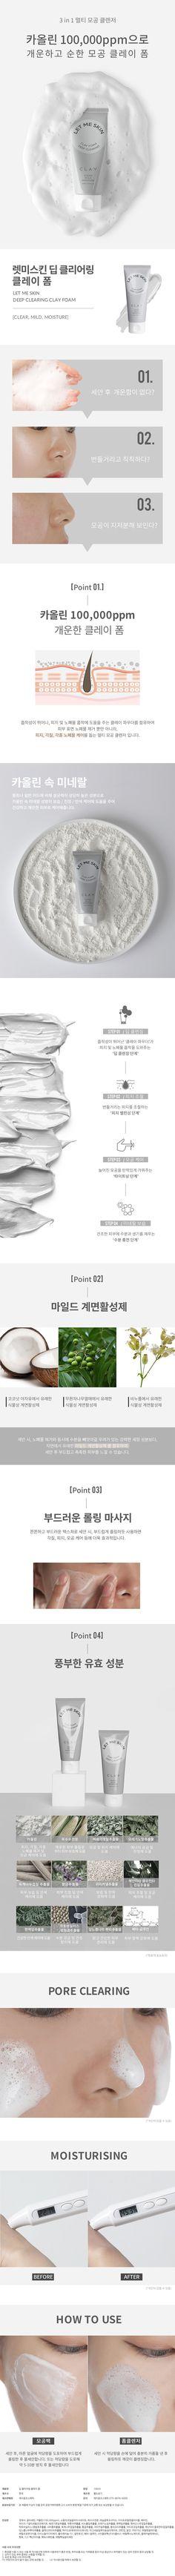 Web Design, Graphic Design Tutorials, Page Design, Cosmetic Web, Cosmetic Design, Web Layout, Layout Design, Visual Advertising, Event Banner